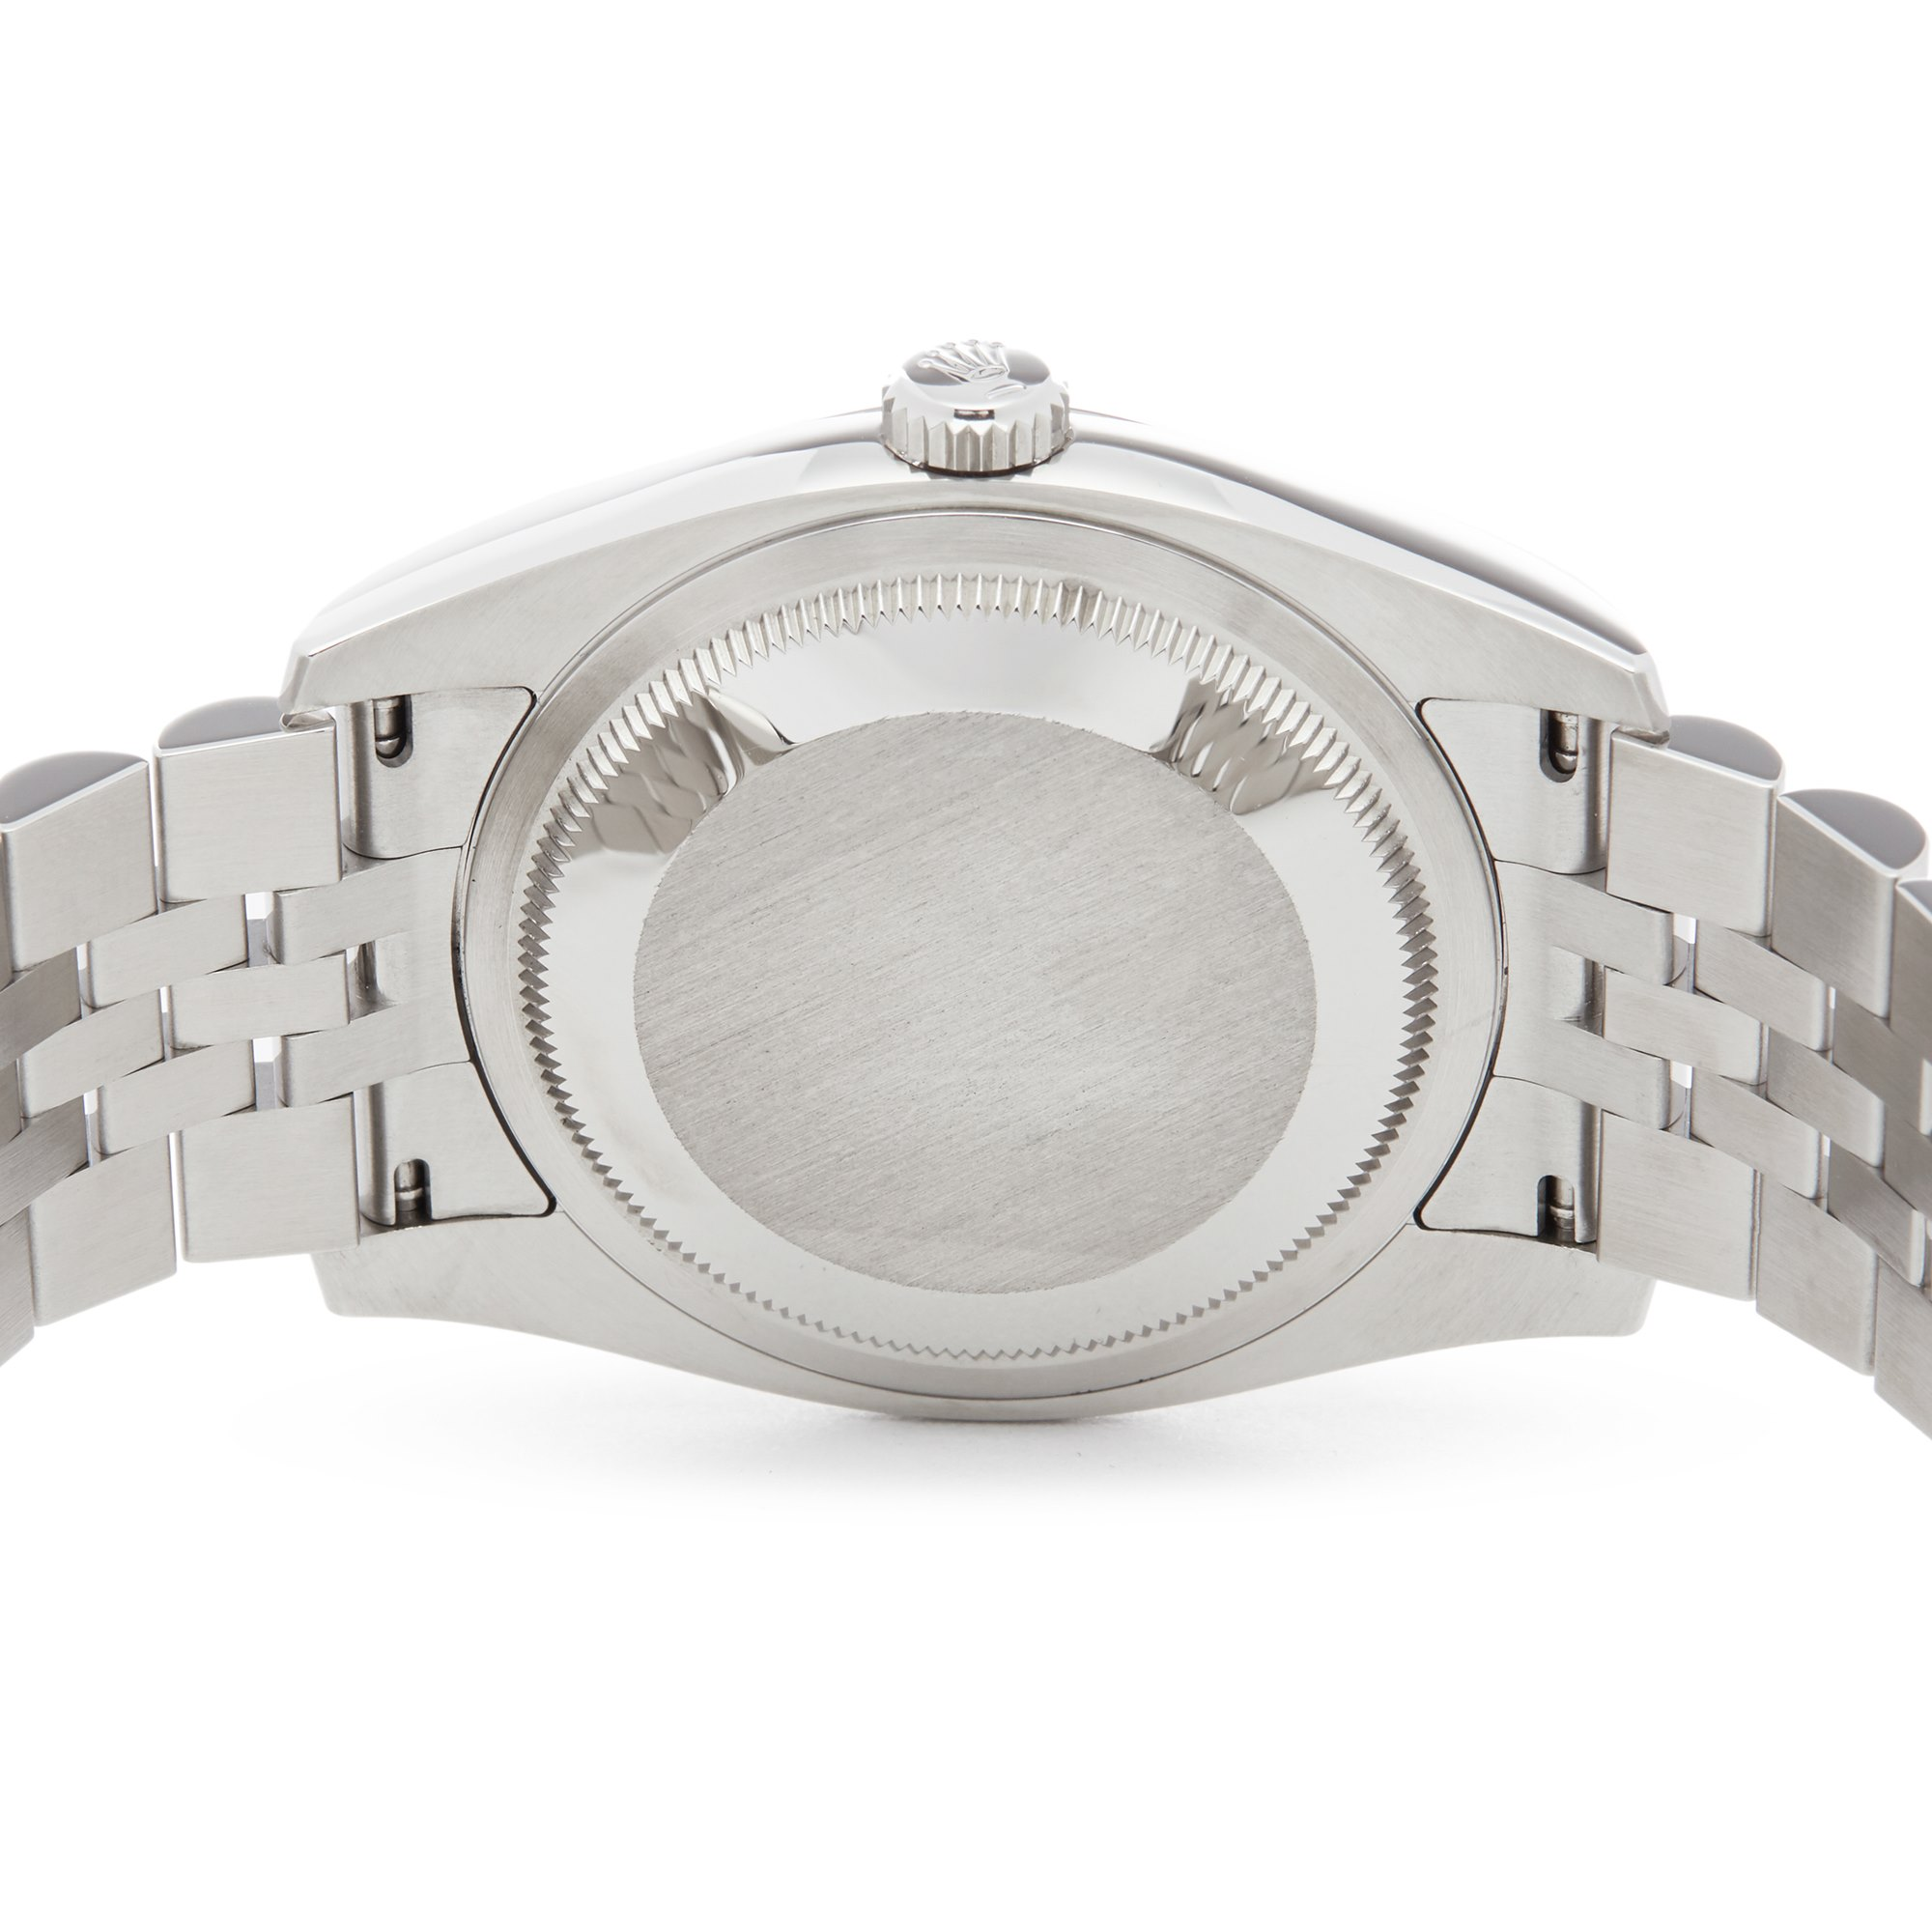 Rolex Datejust 36 Diamond Roestvrij Staal 116234